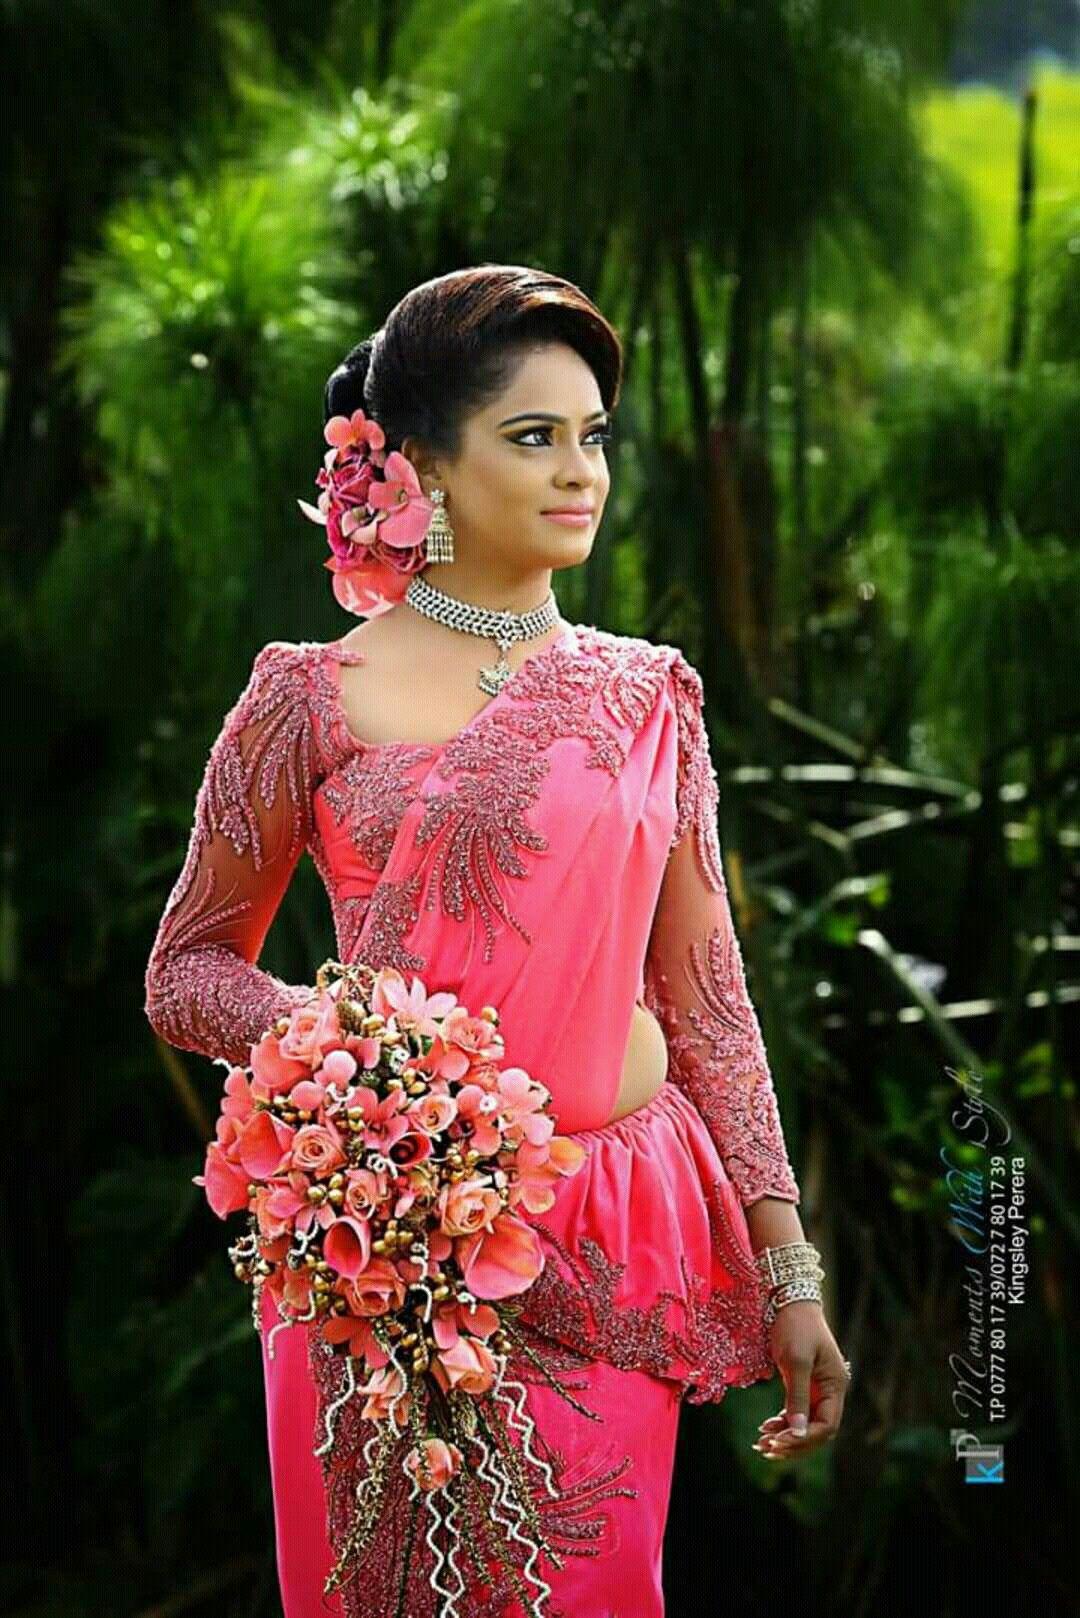 Pin By Yashodara Rathnathilaka On 2nd Day Brides